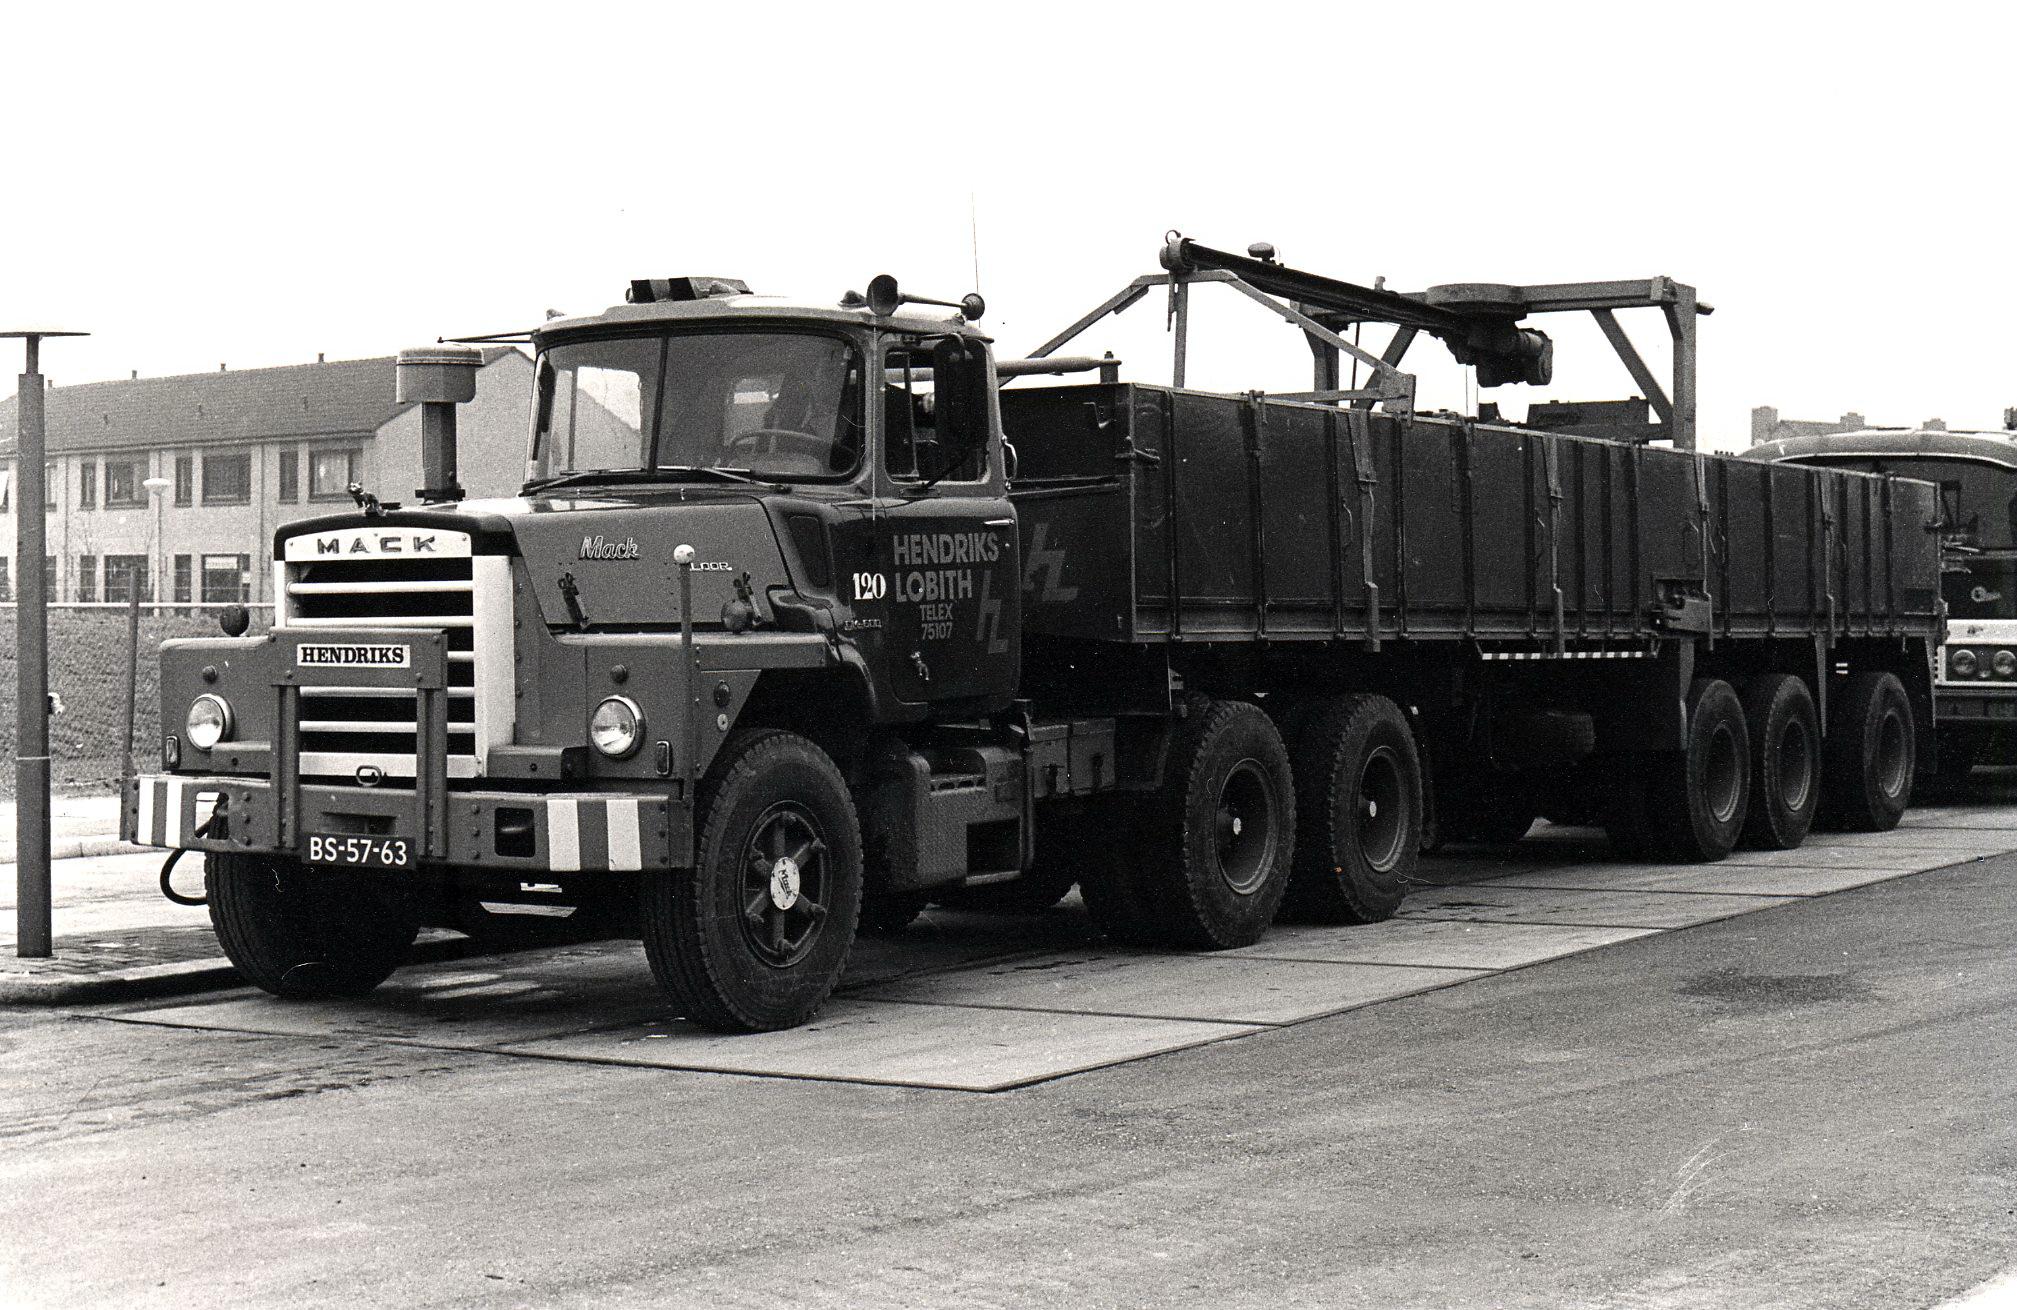 Hendriks-Lobith-Mack-DM609-S-BS5763